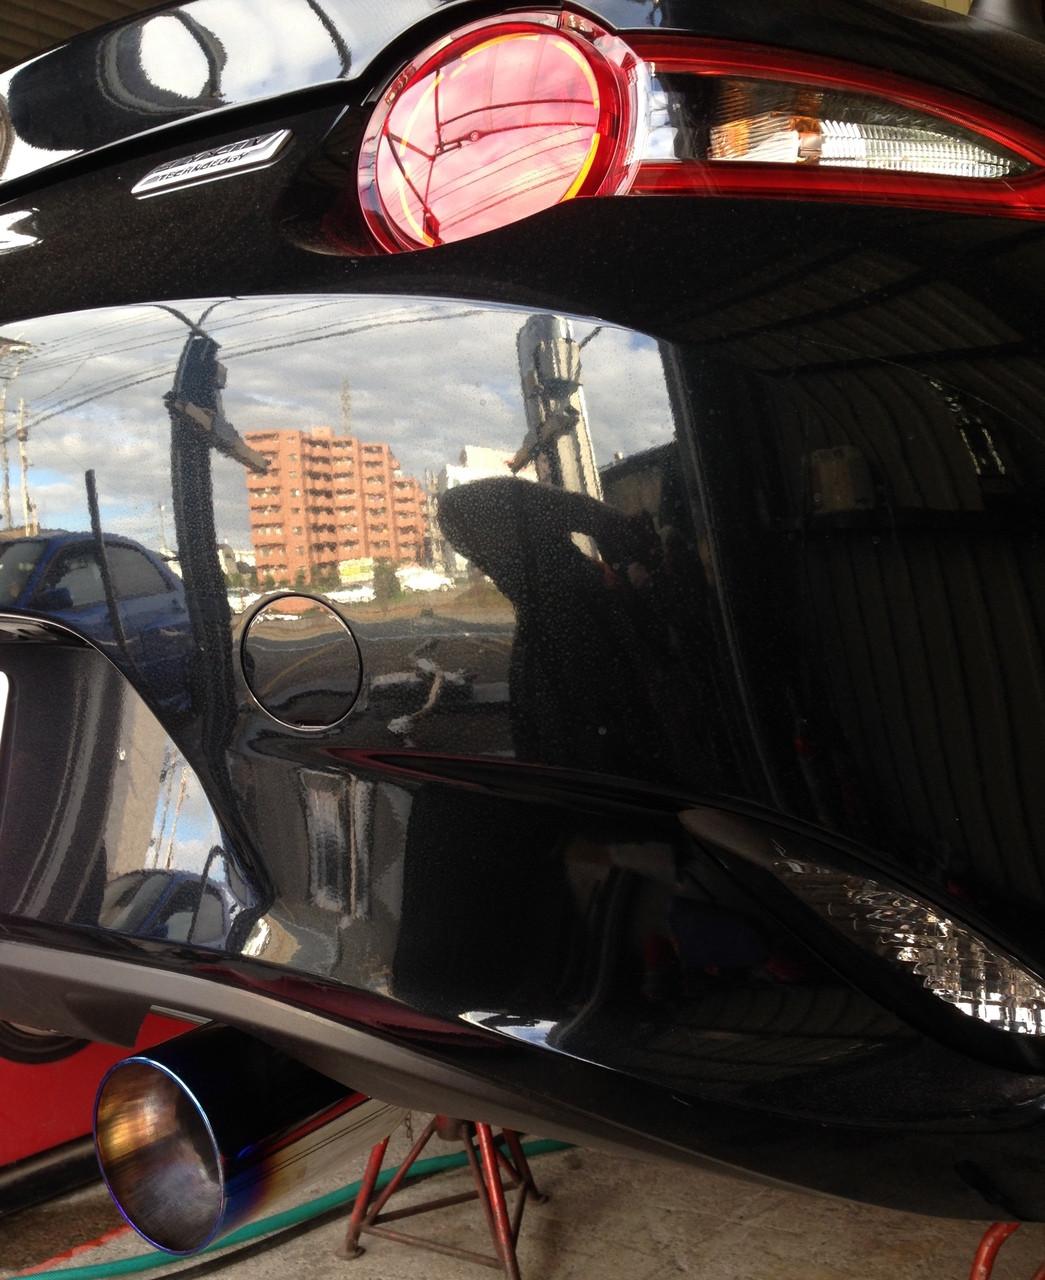 Exhaust Header Back Miata ND 5RC LNR16A3HA065T